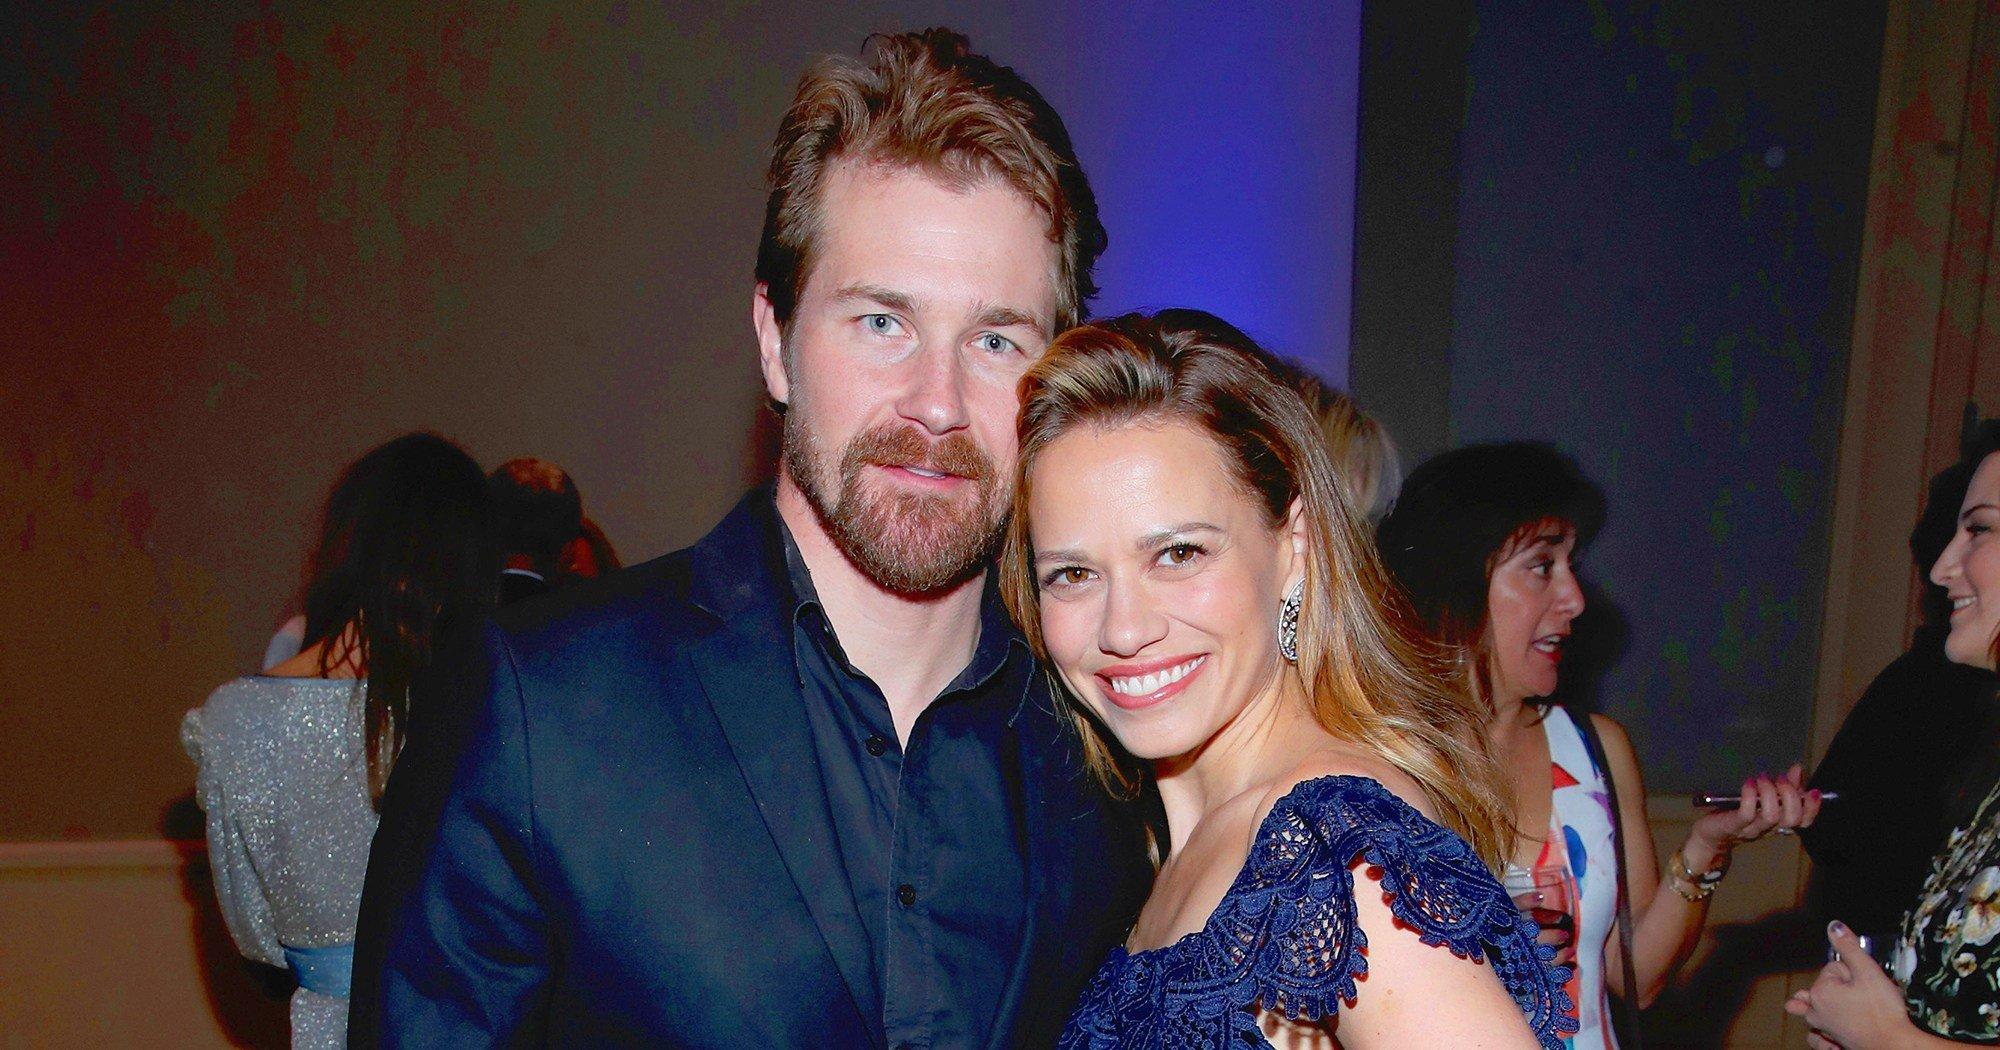 New Couple Alert! Bethany Joy Lenz and Josh Kelly Are Dating